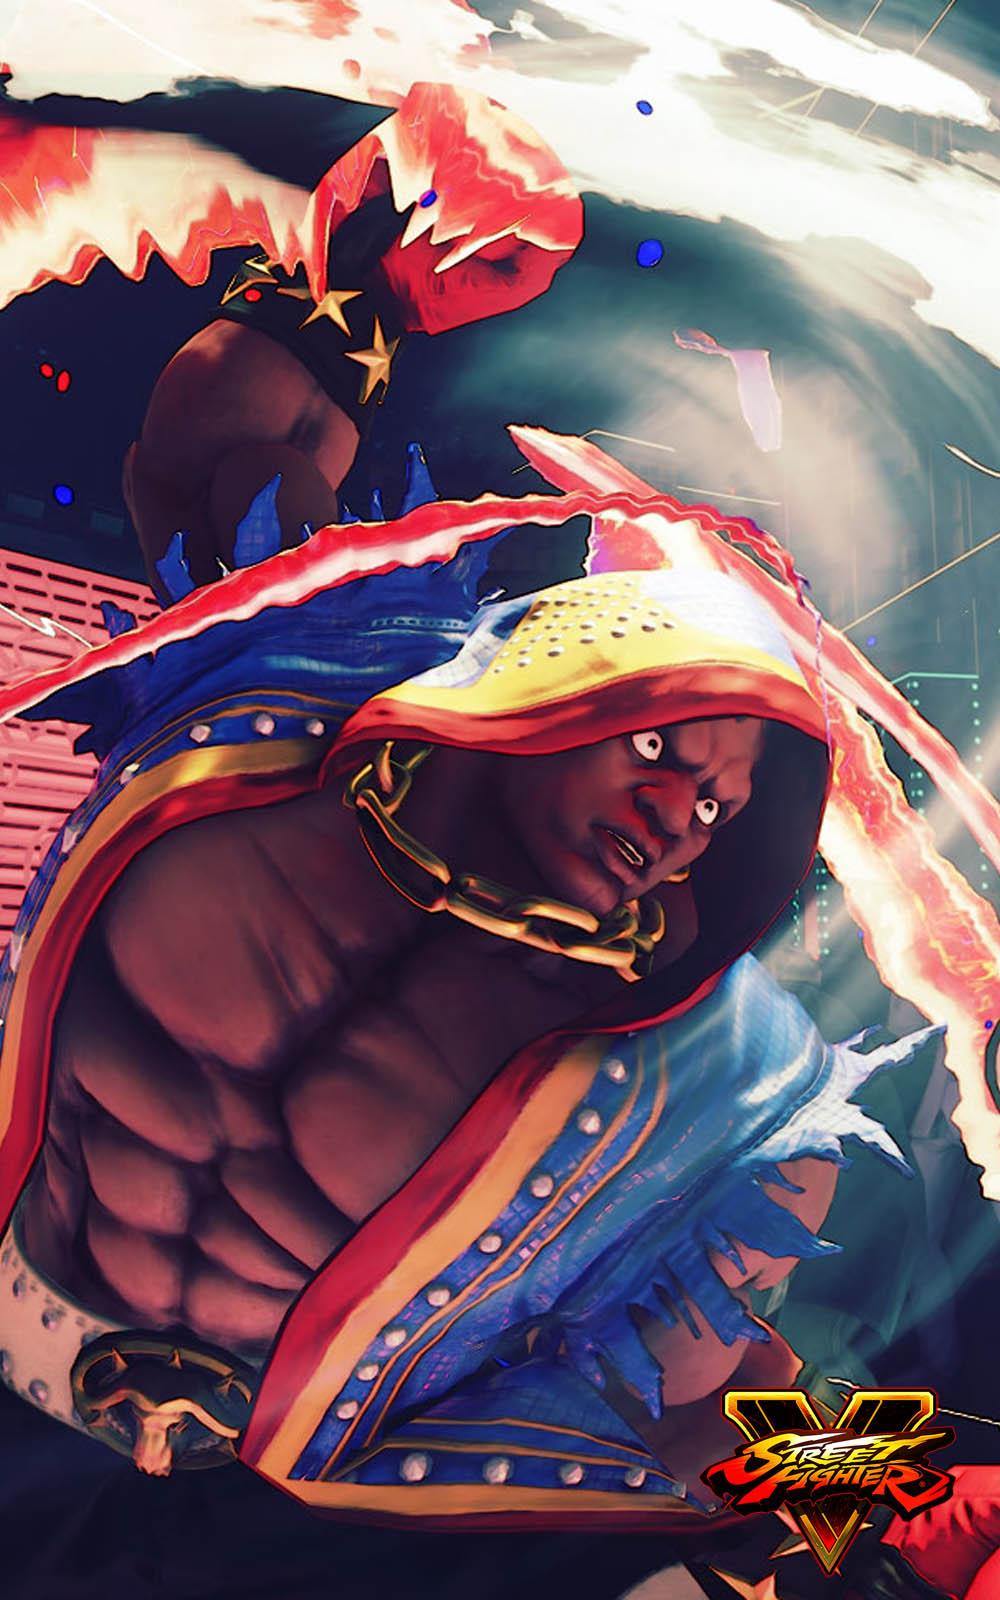 Download balrog street fighter 5 hero free pure 4k ultra - Street fighter 2 wallpaper hd ...